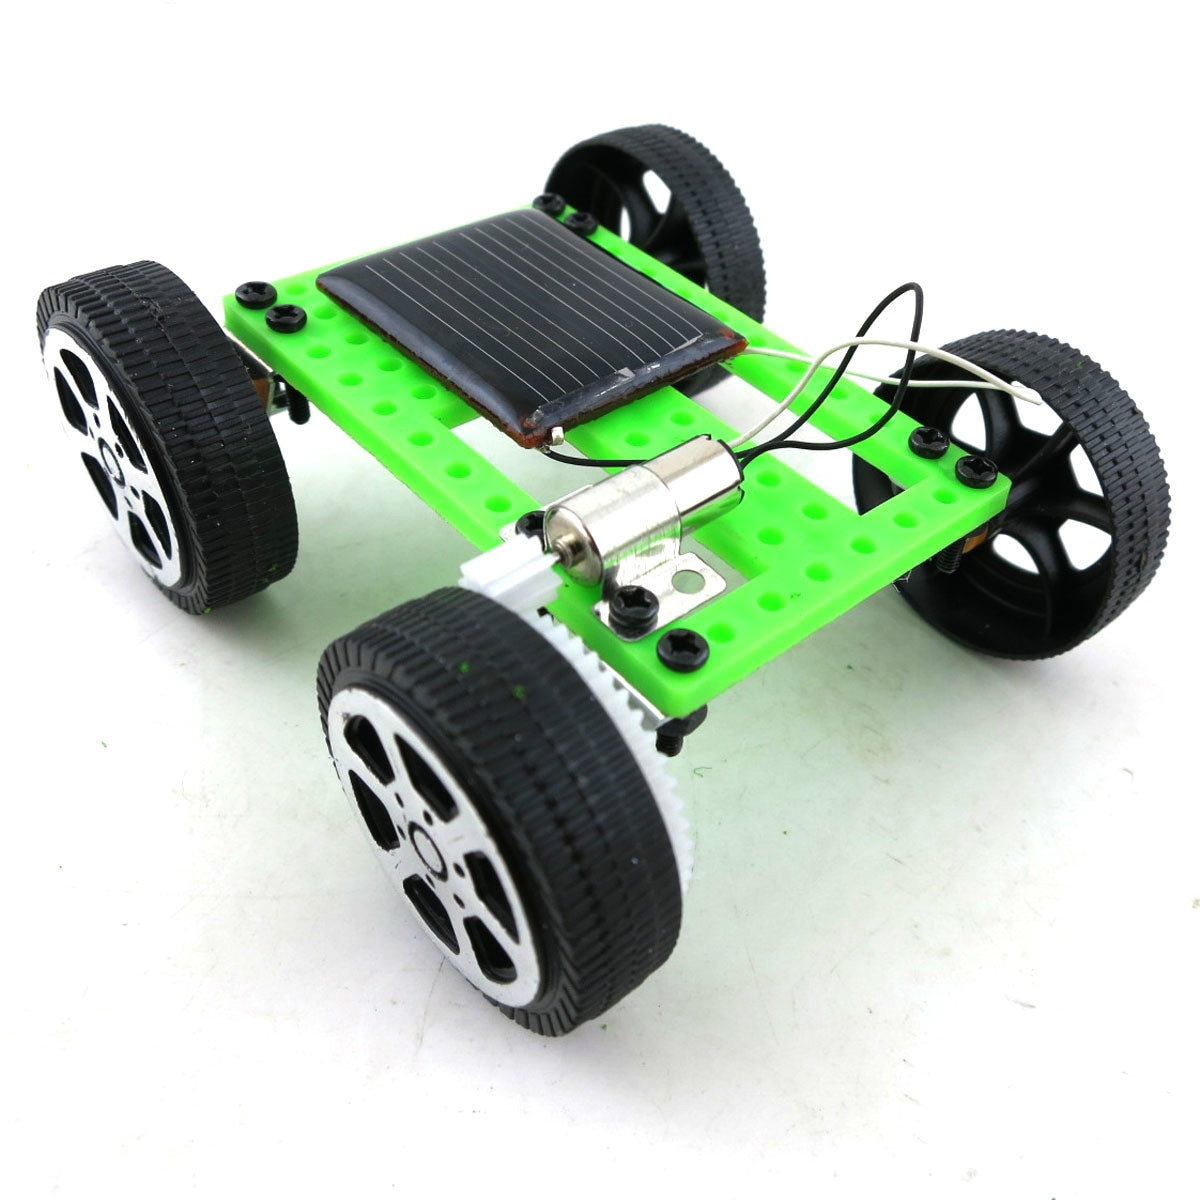 Energía Crazy Mini coche de juguete con energía Solar DIY RC Car ABS Kit de Robot con energía Solar para niños artefacto divertido educativo regalo de Hobby